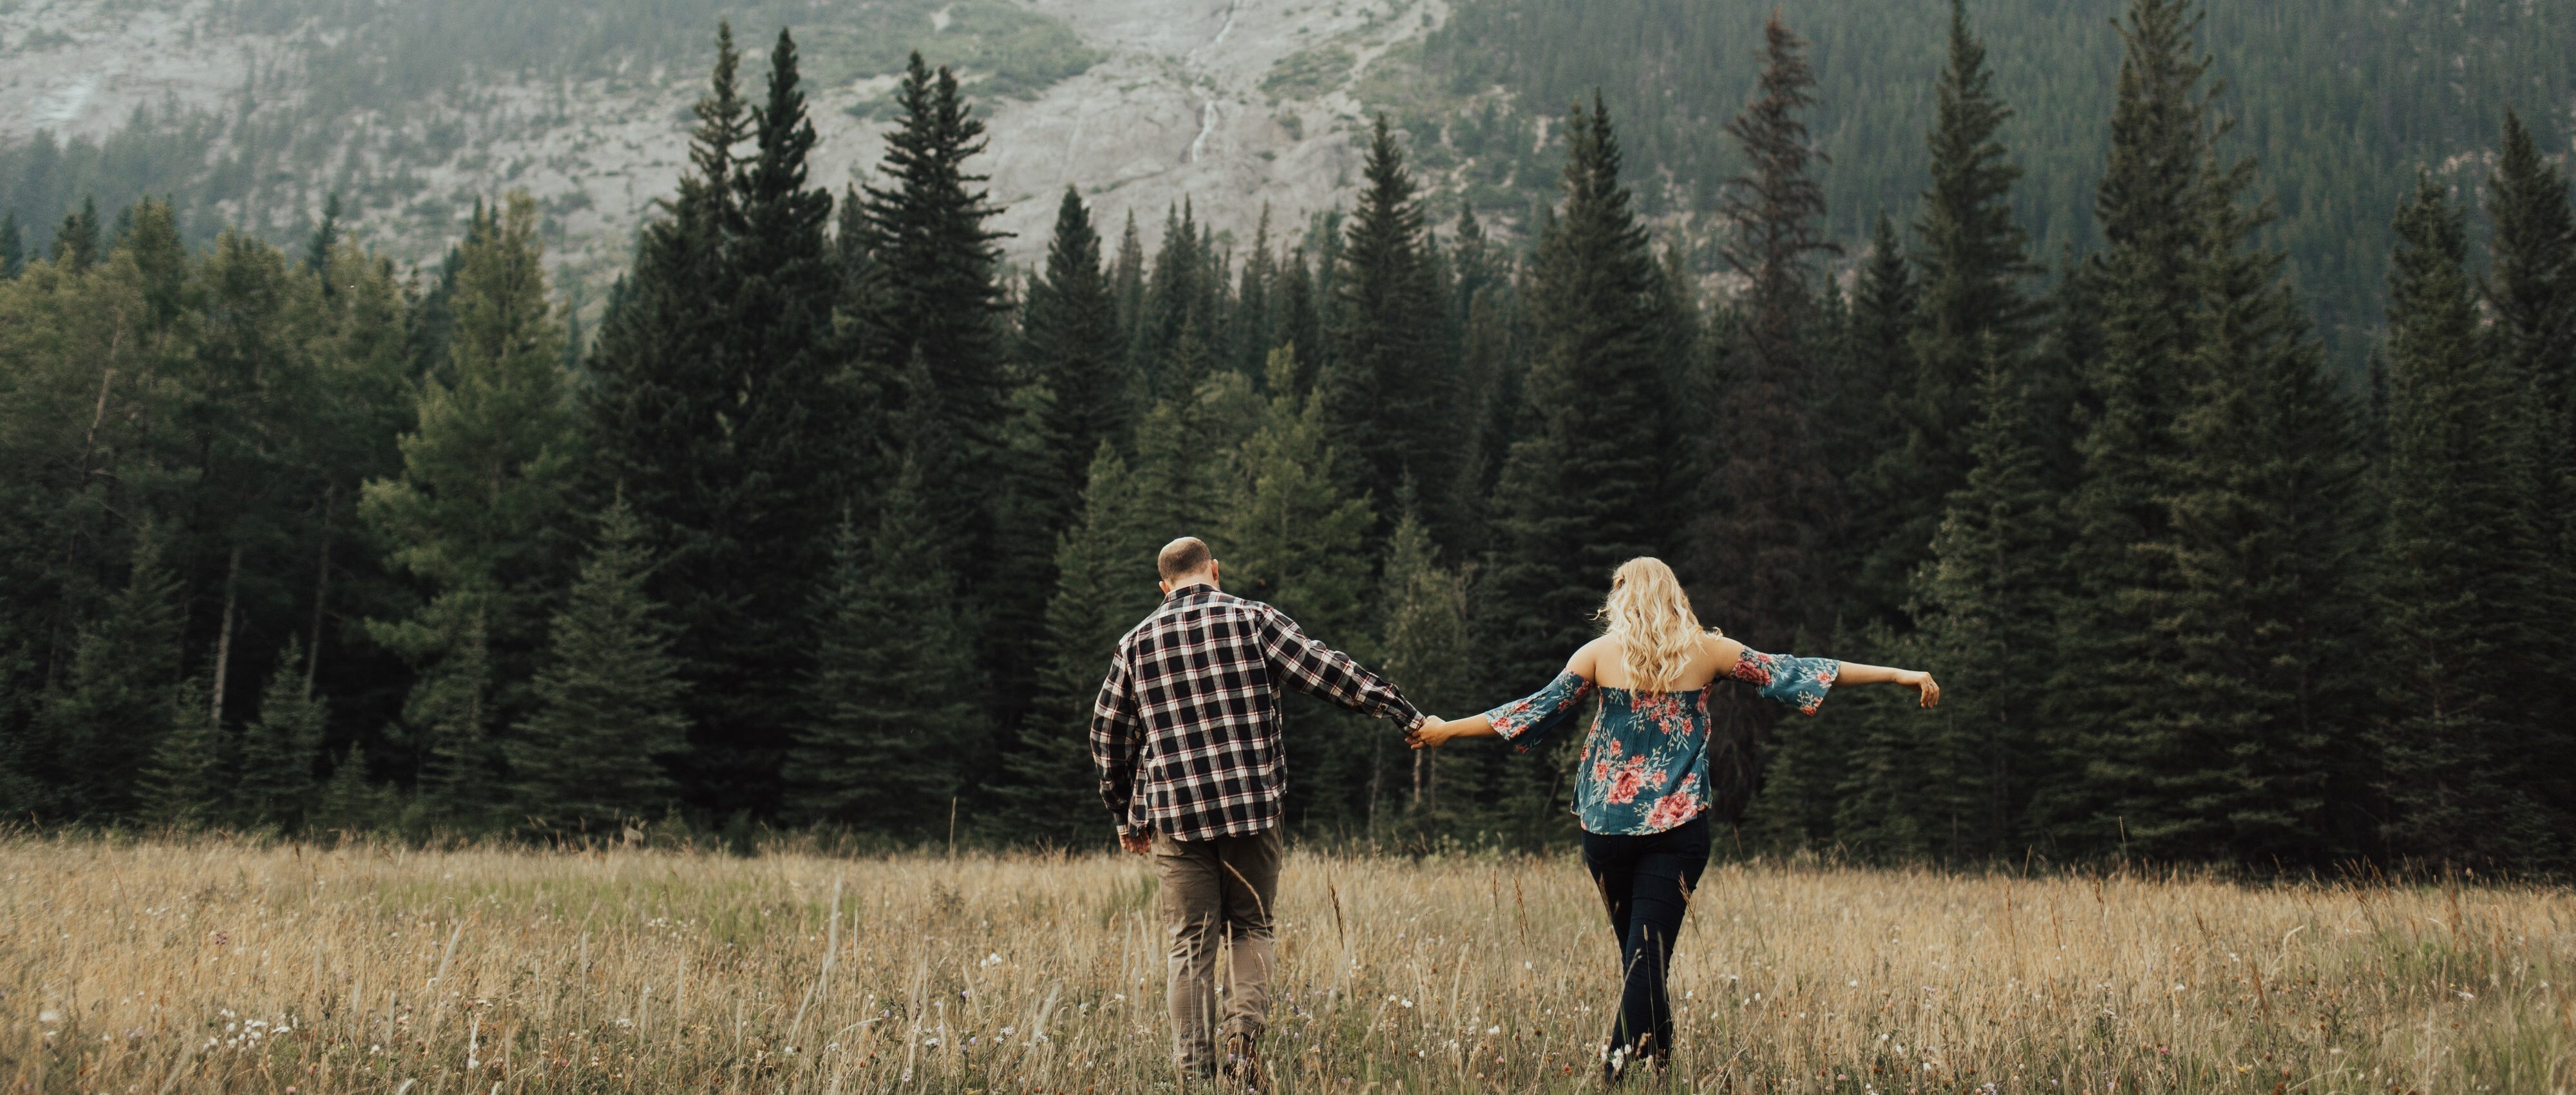 navigating adventure, faith, and failure